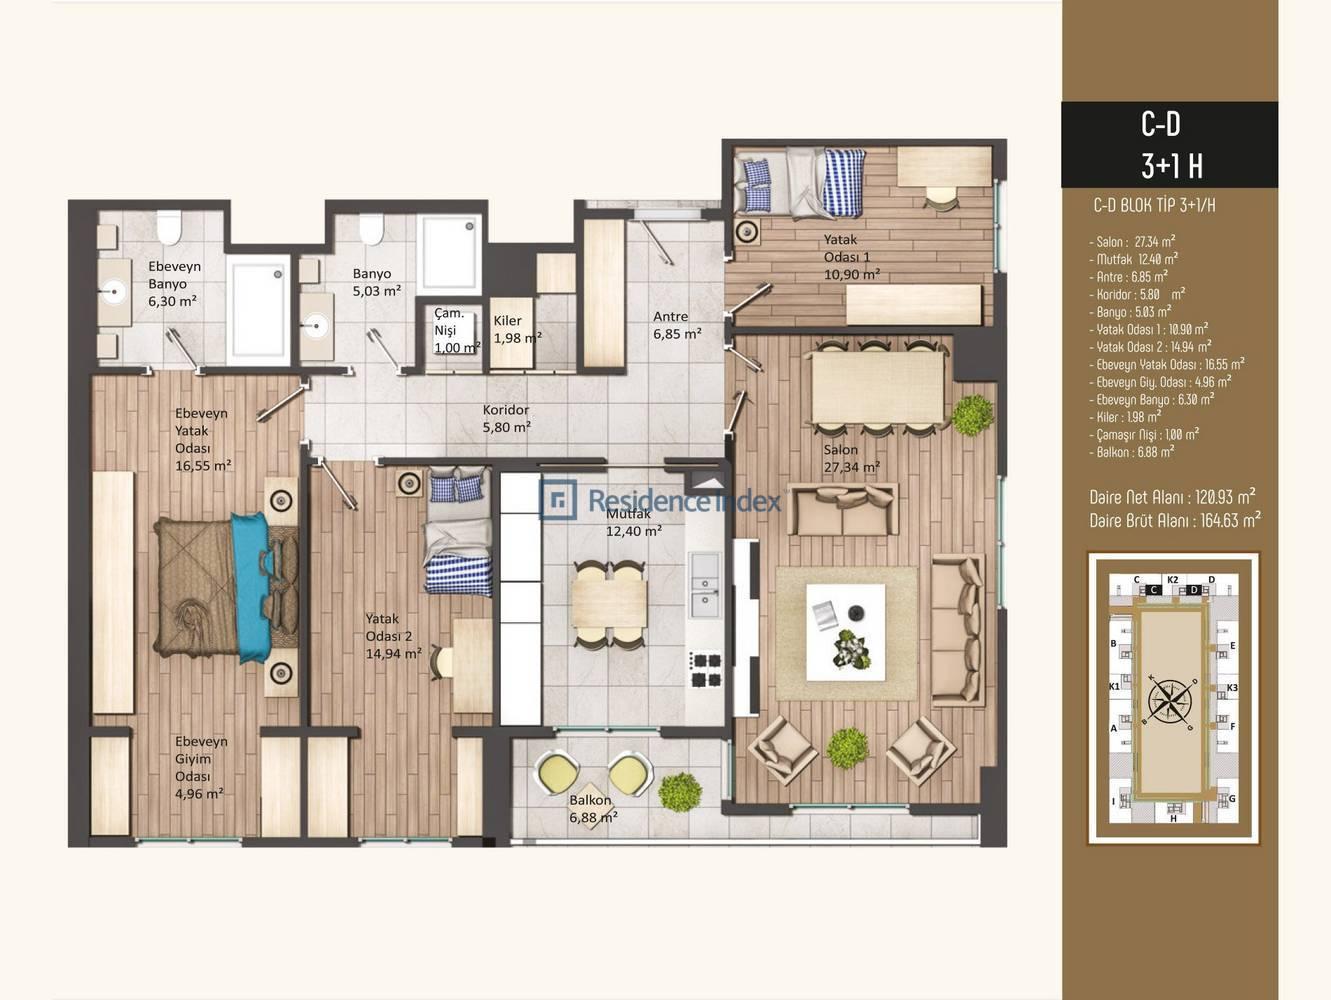 Kameroğlu Metrohome Residence 3+1 H